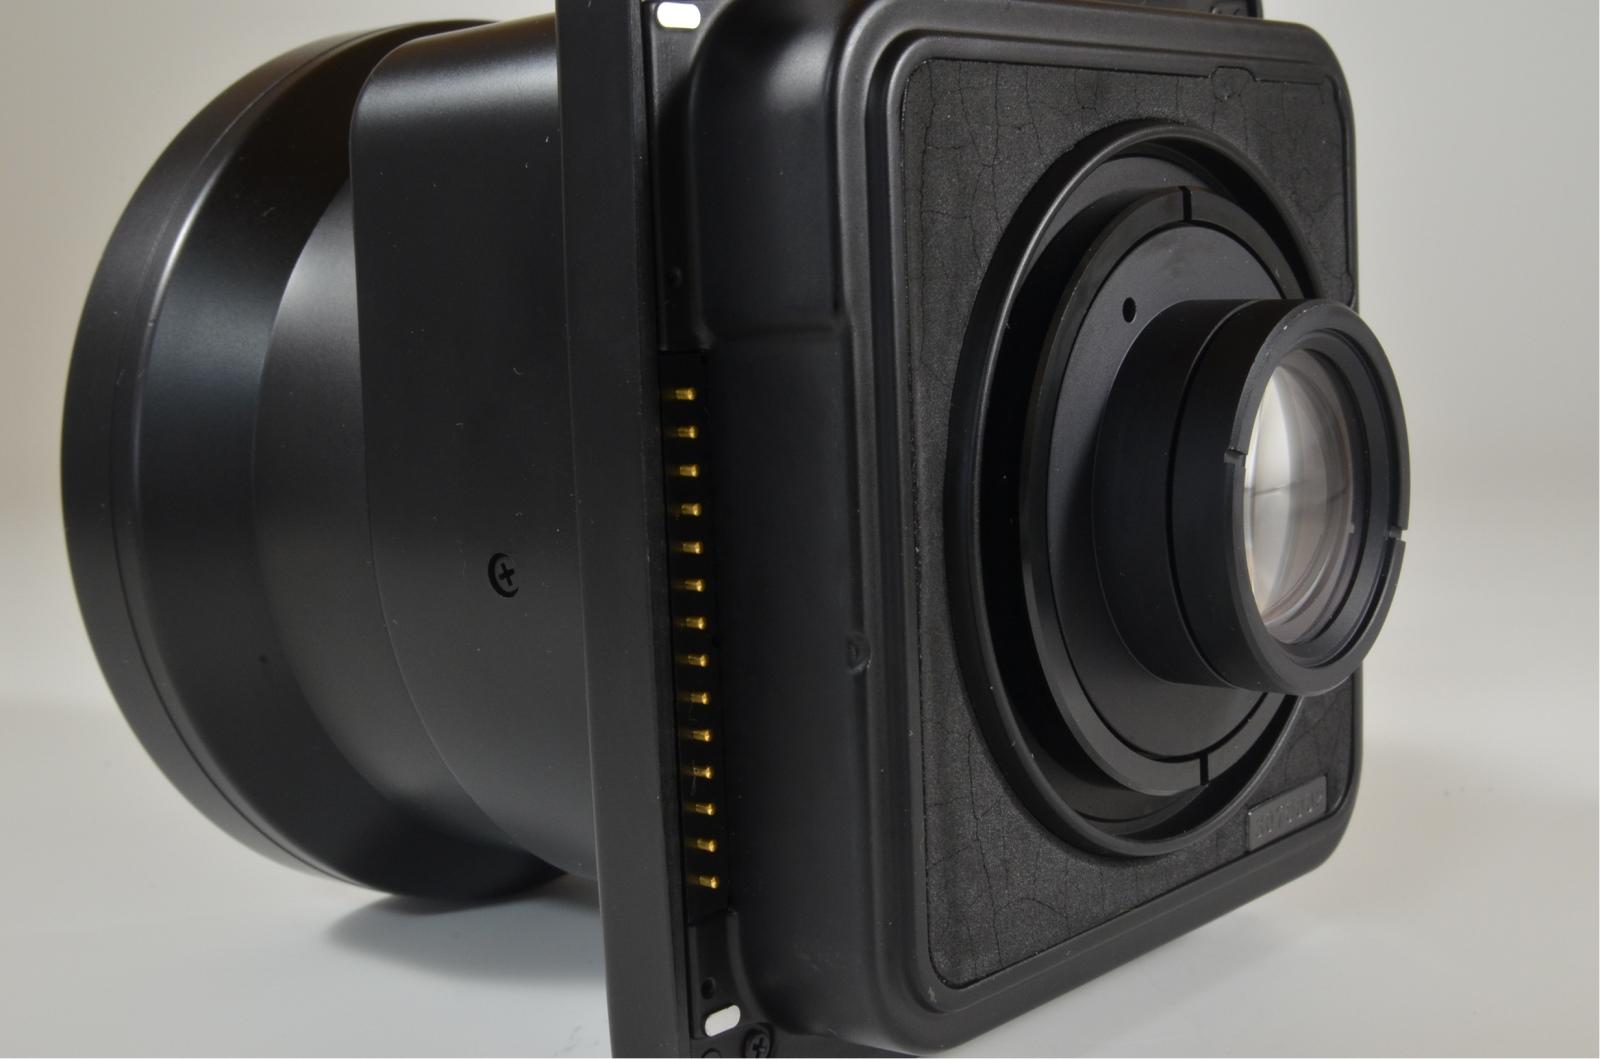 fuji fujifilm ebc fujinon gx 65mm f/5.6 for gx680 lens